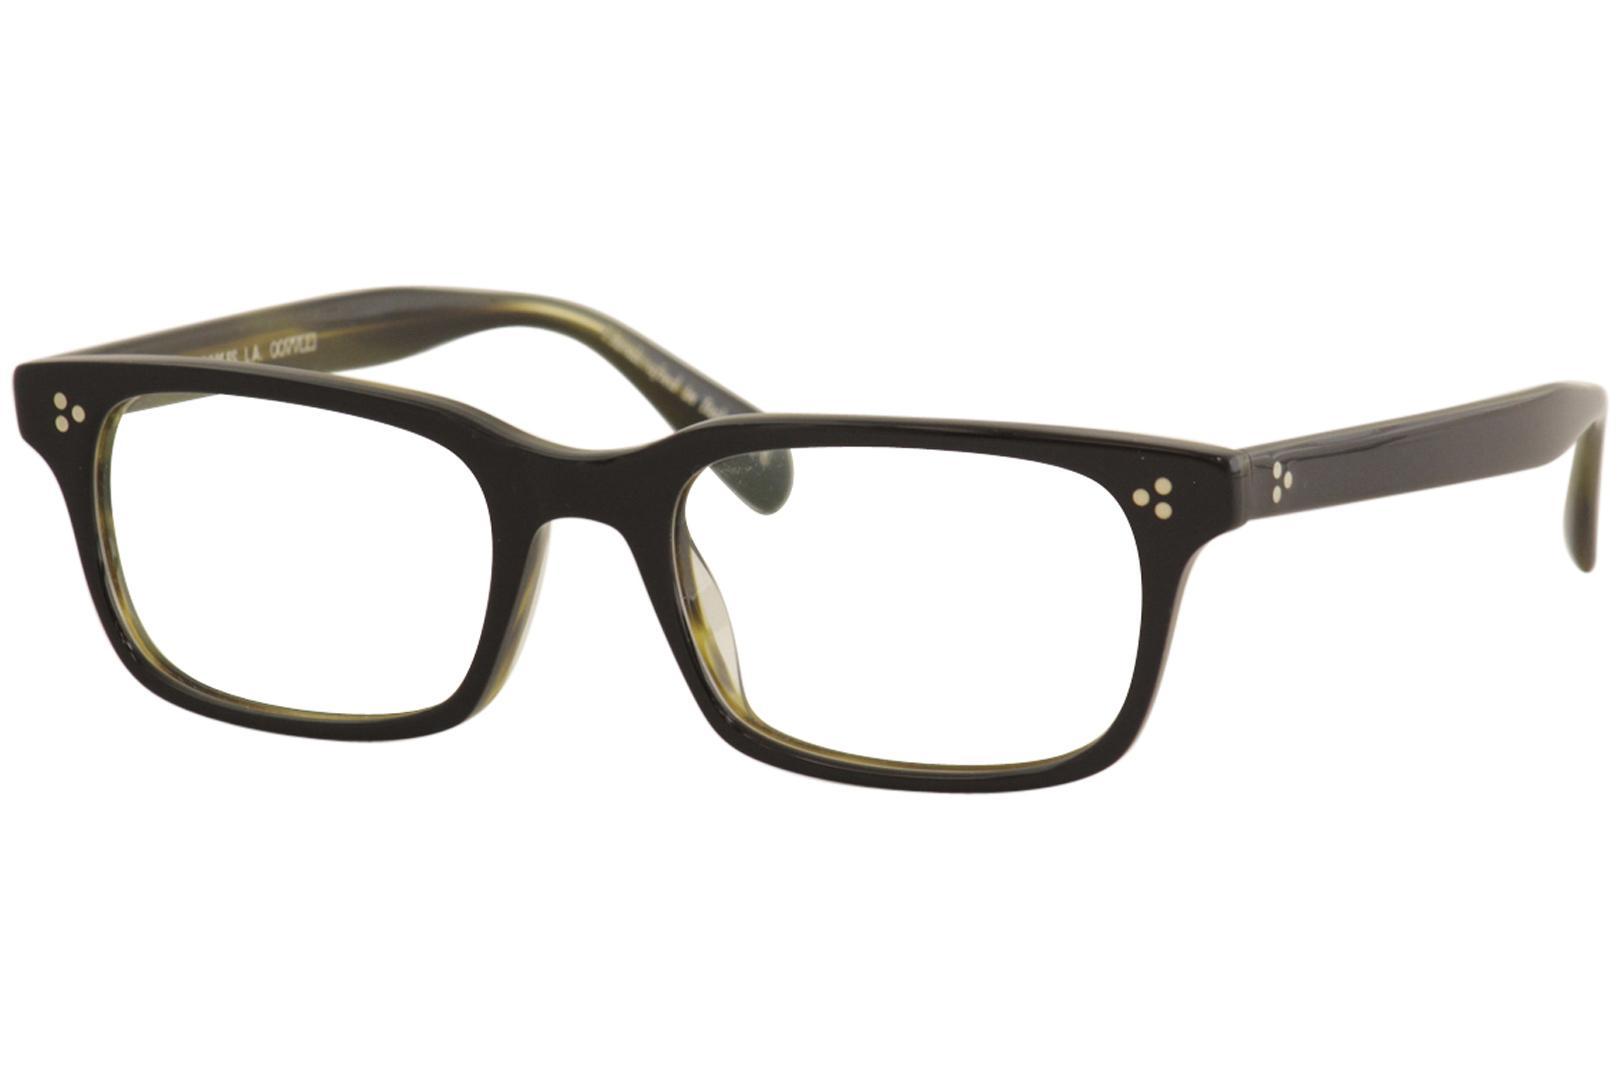 Image of - Black/Olive Tortoise   1441 - Lens 53 Bridge 20 B 35.6 ED 55.2 Temple 145mm